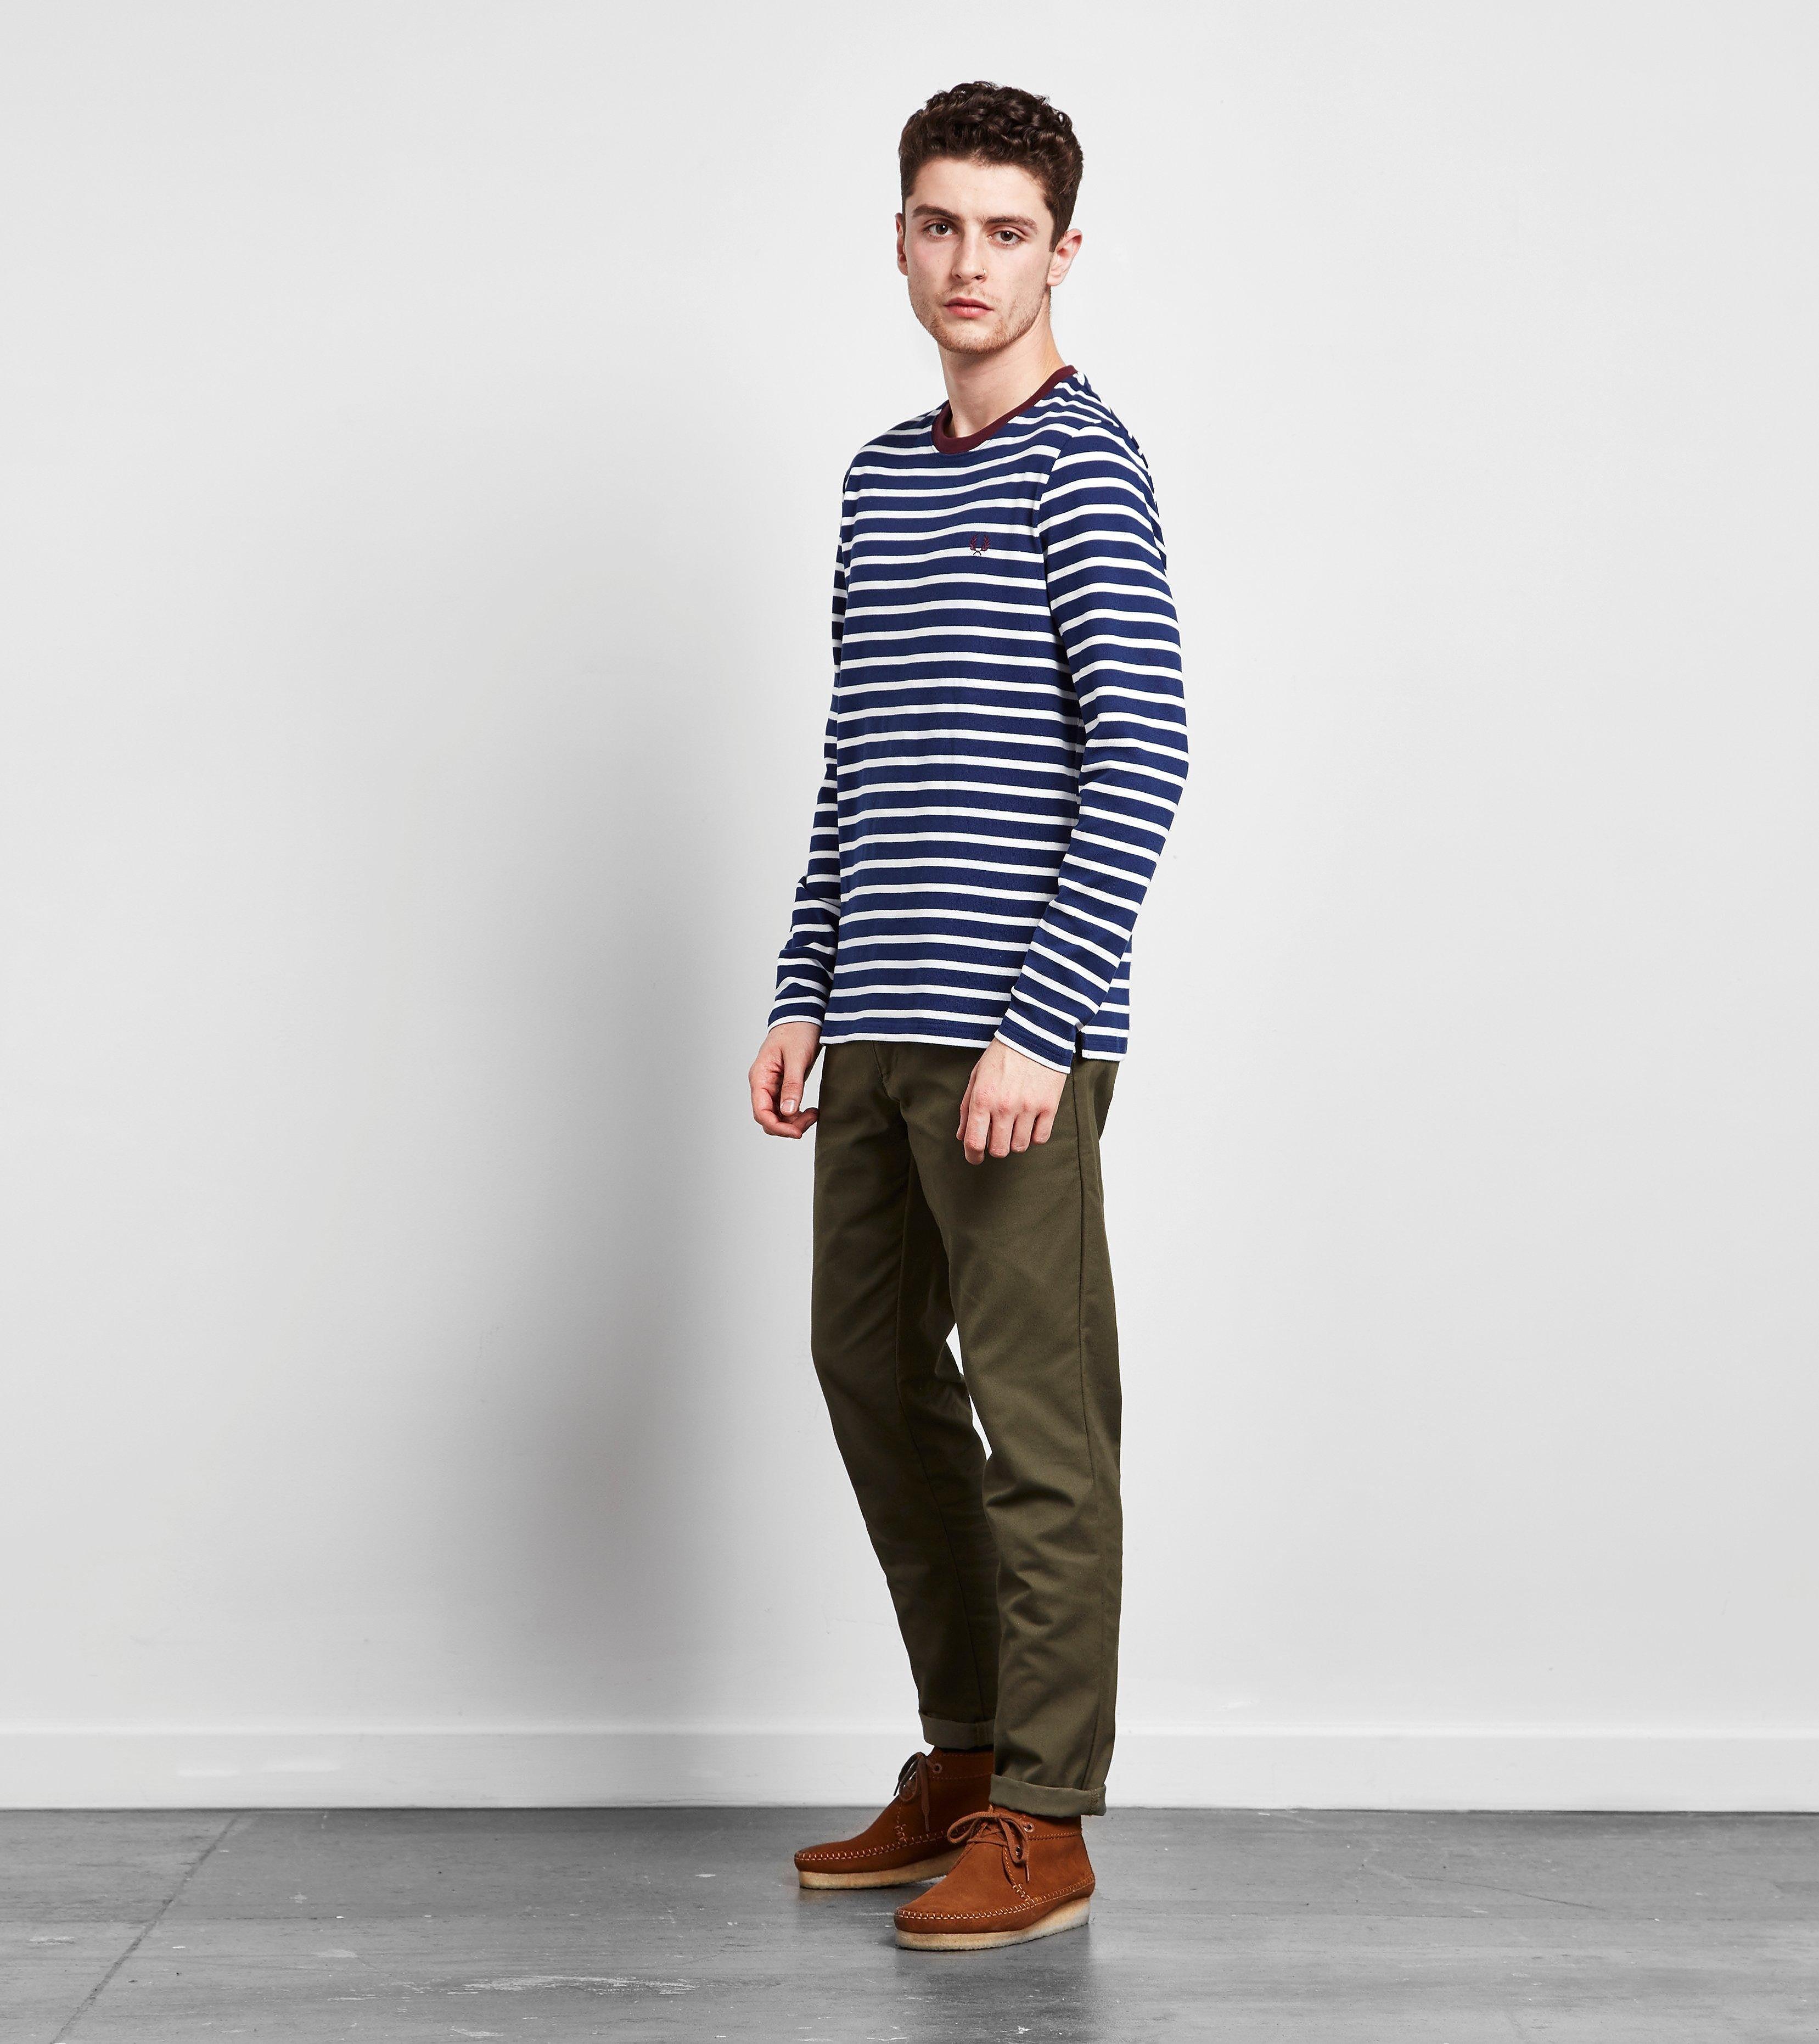 Fred Perry Breton Stripe Long-Sleeved T-Shirt